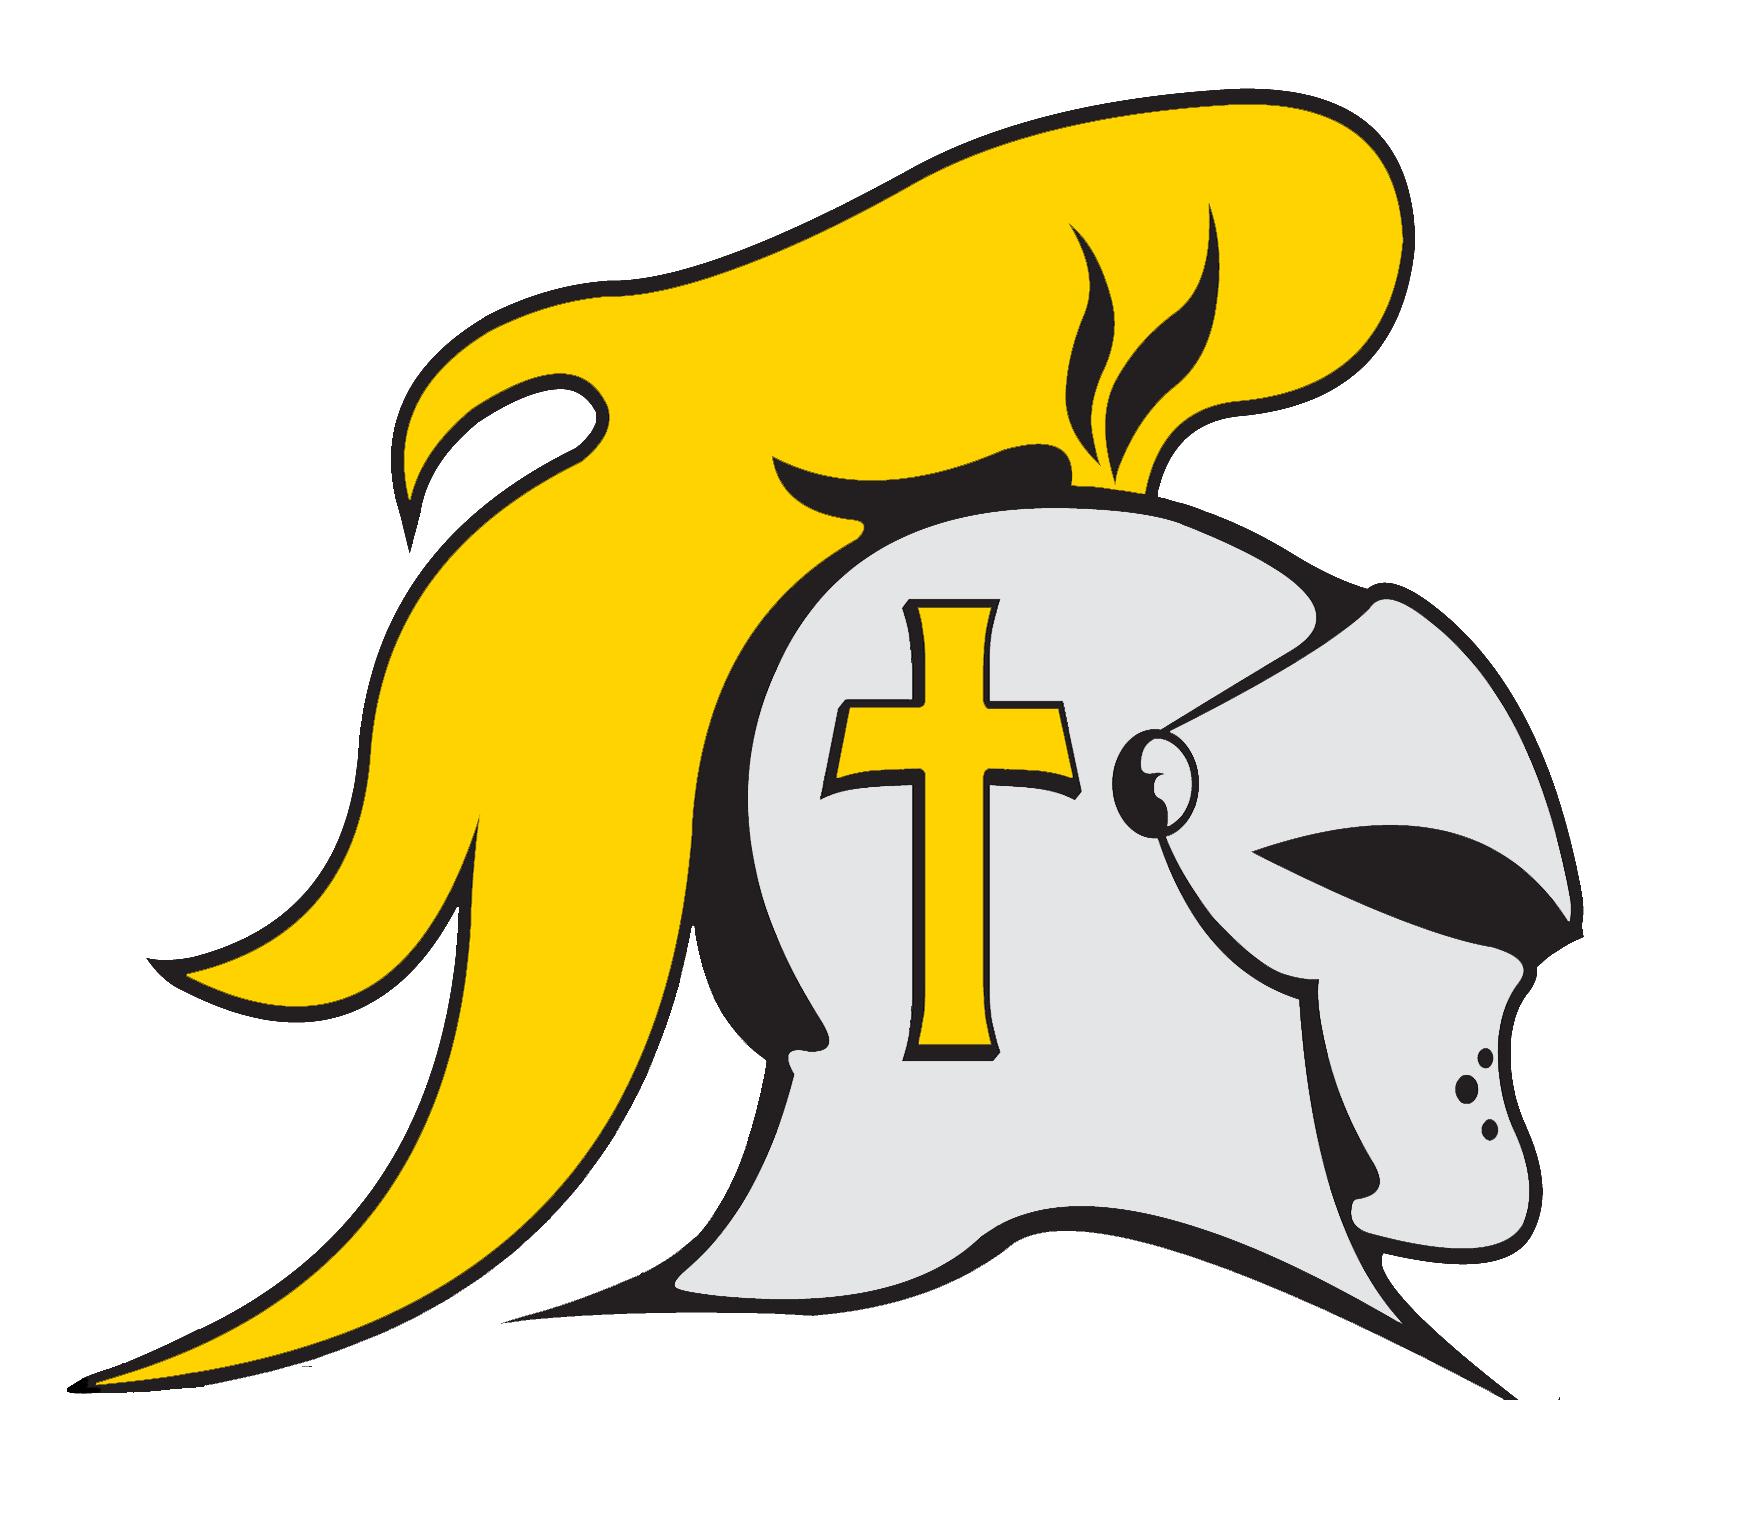 Warrior clipart logo. Files christian academy school